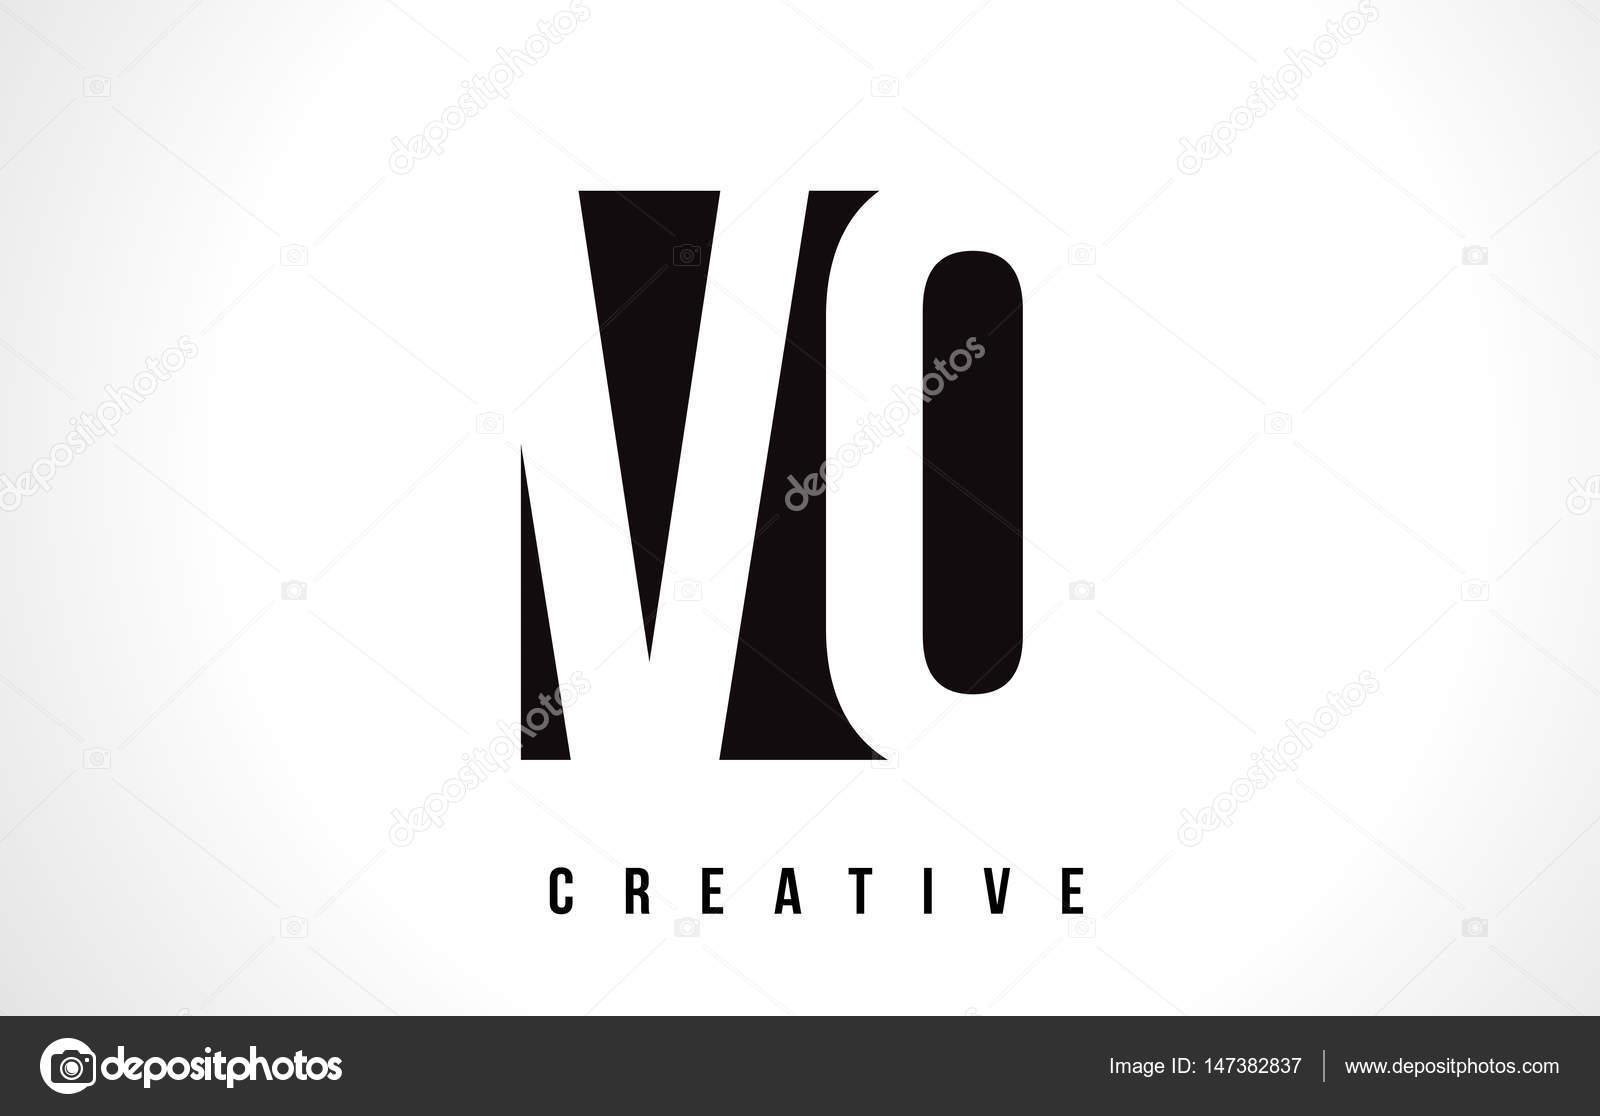 vo v o white letter logo design with black square stock vector